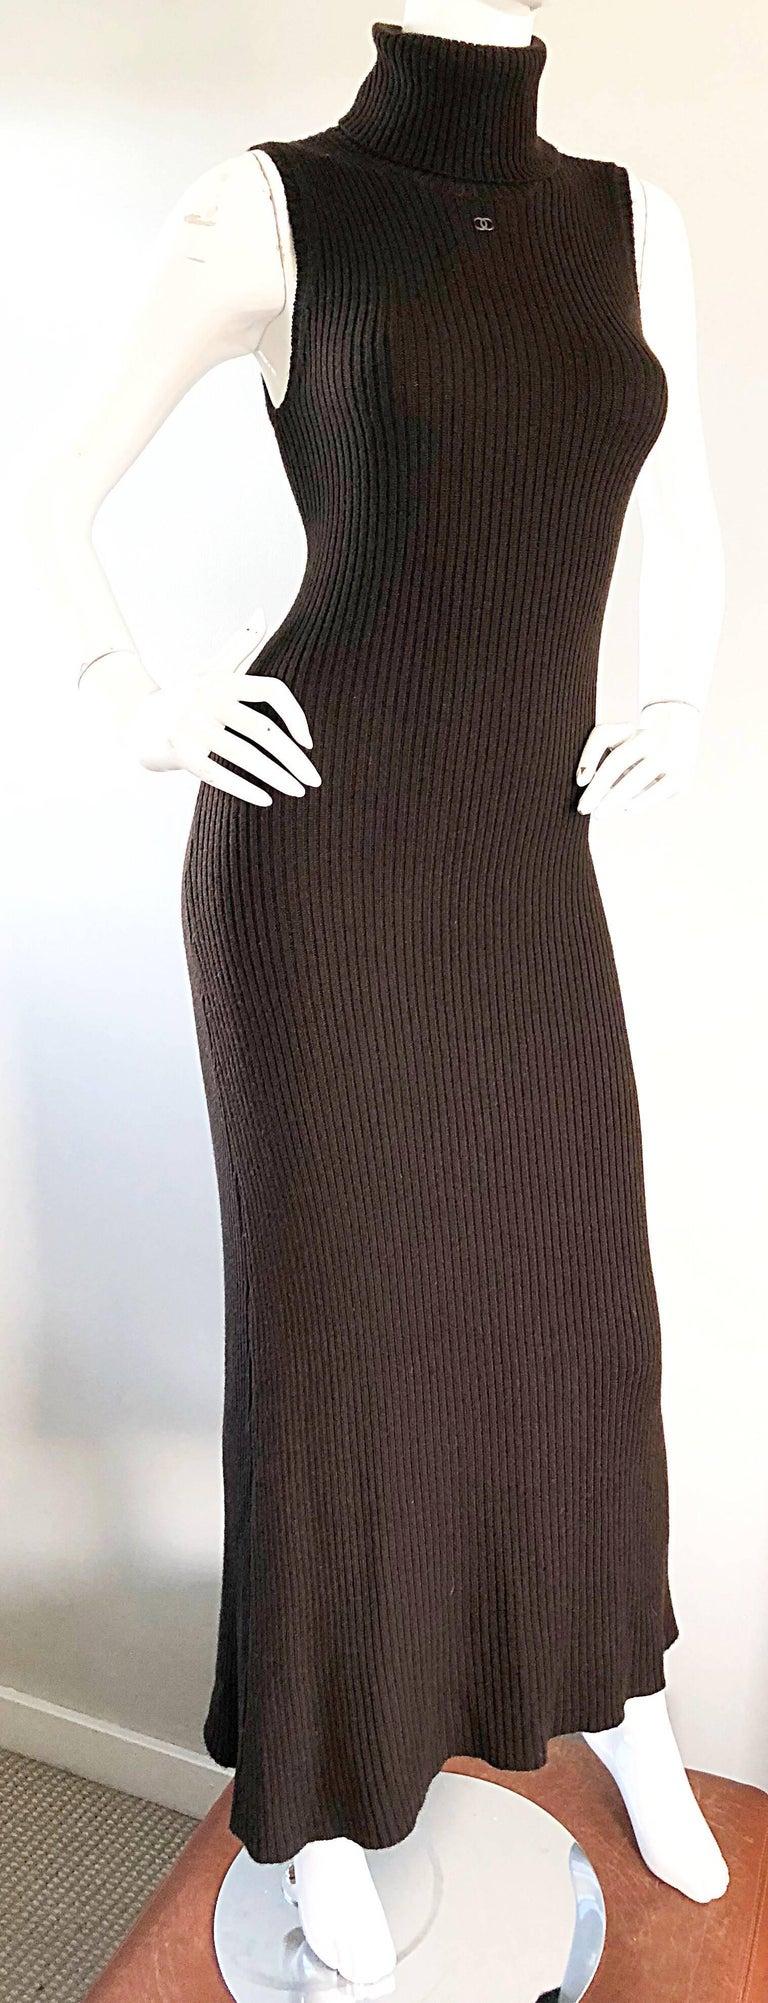 Chanel Vintage 99A Espresso Brown Cashmere Turtleneck 1990s 90s Sweater Dress 7